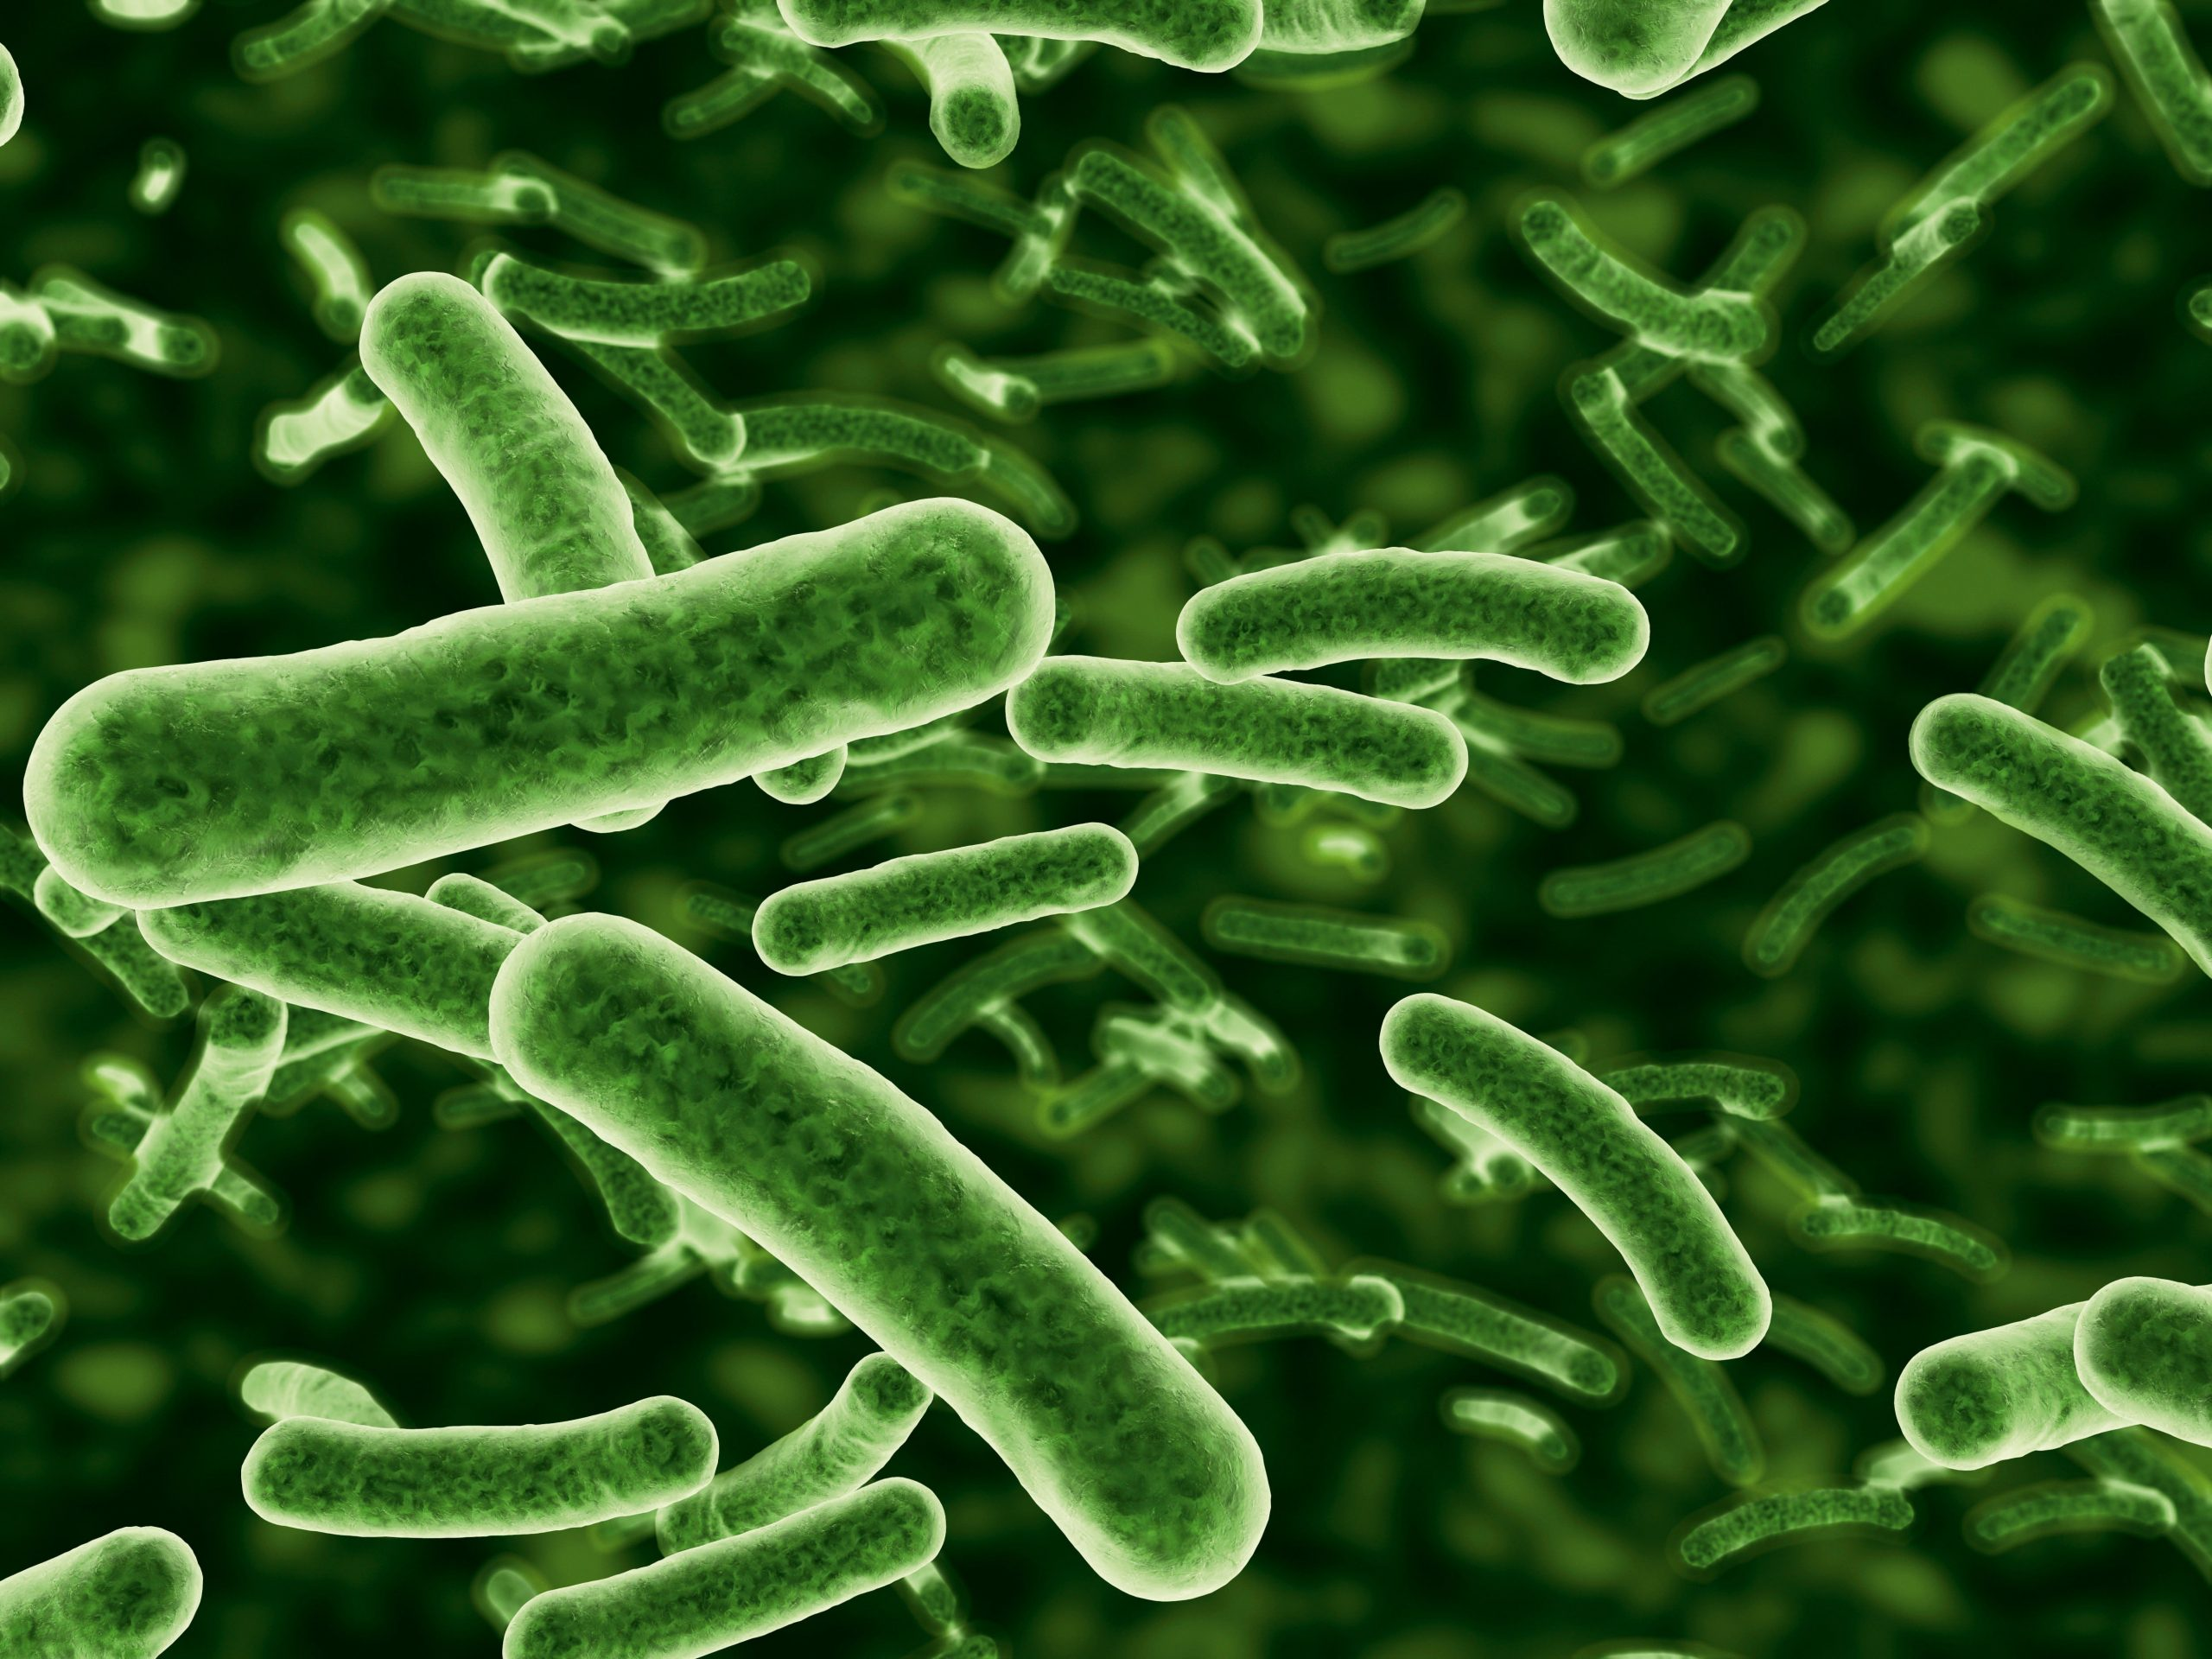 bacterii exemple